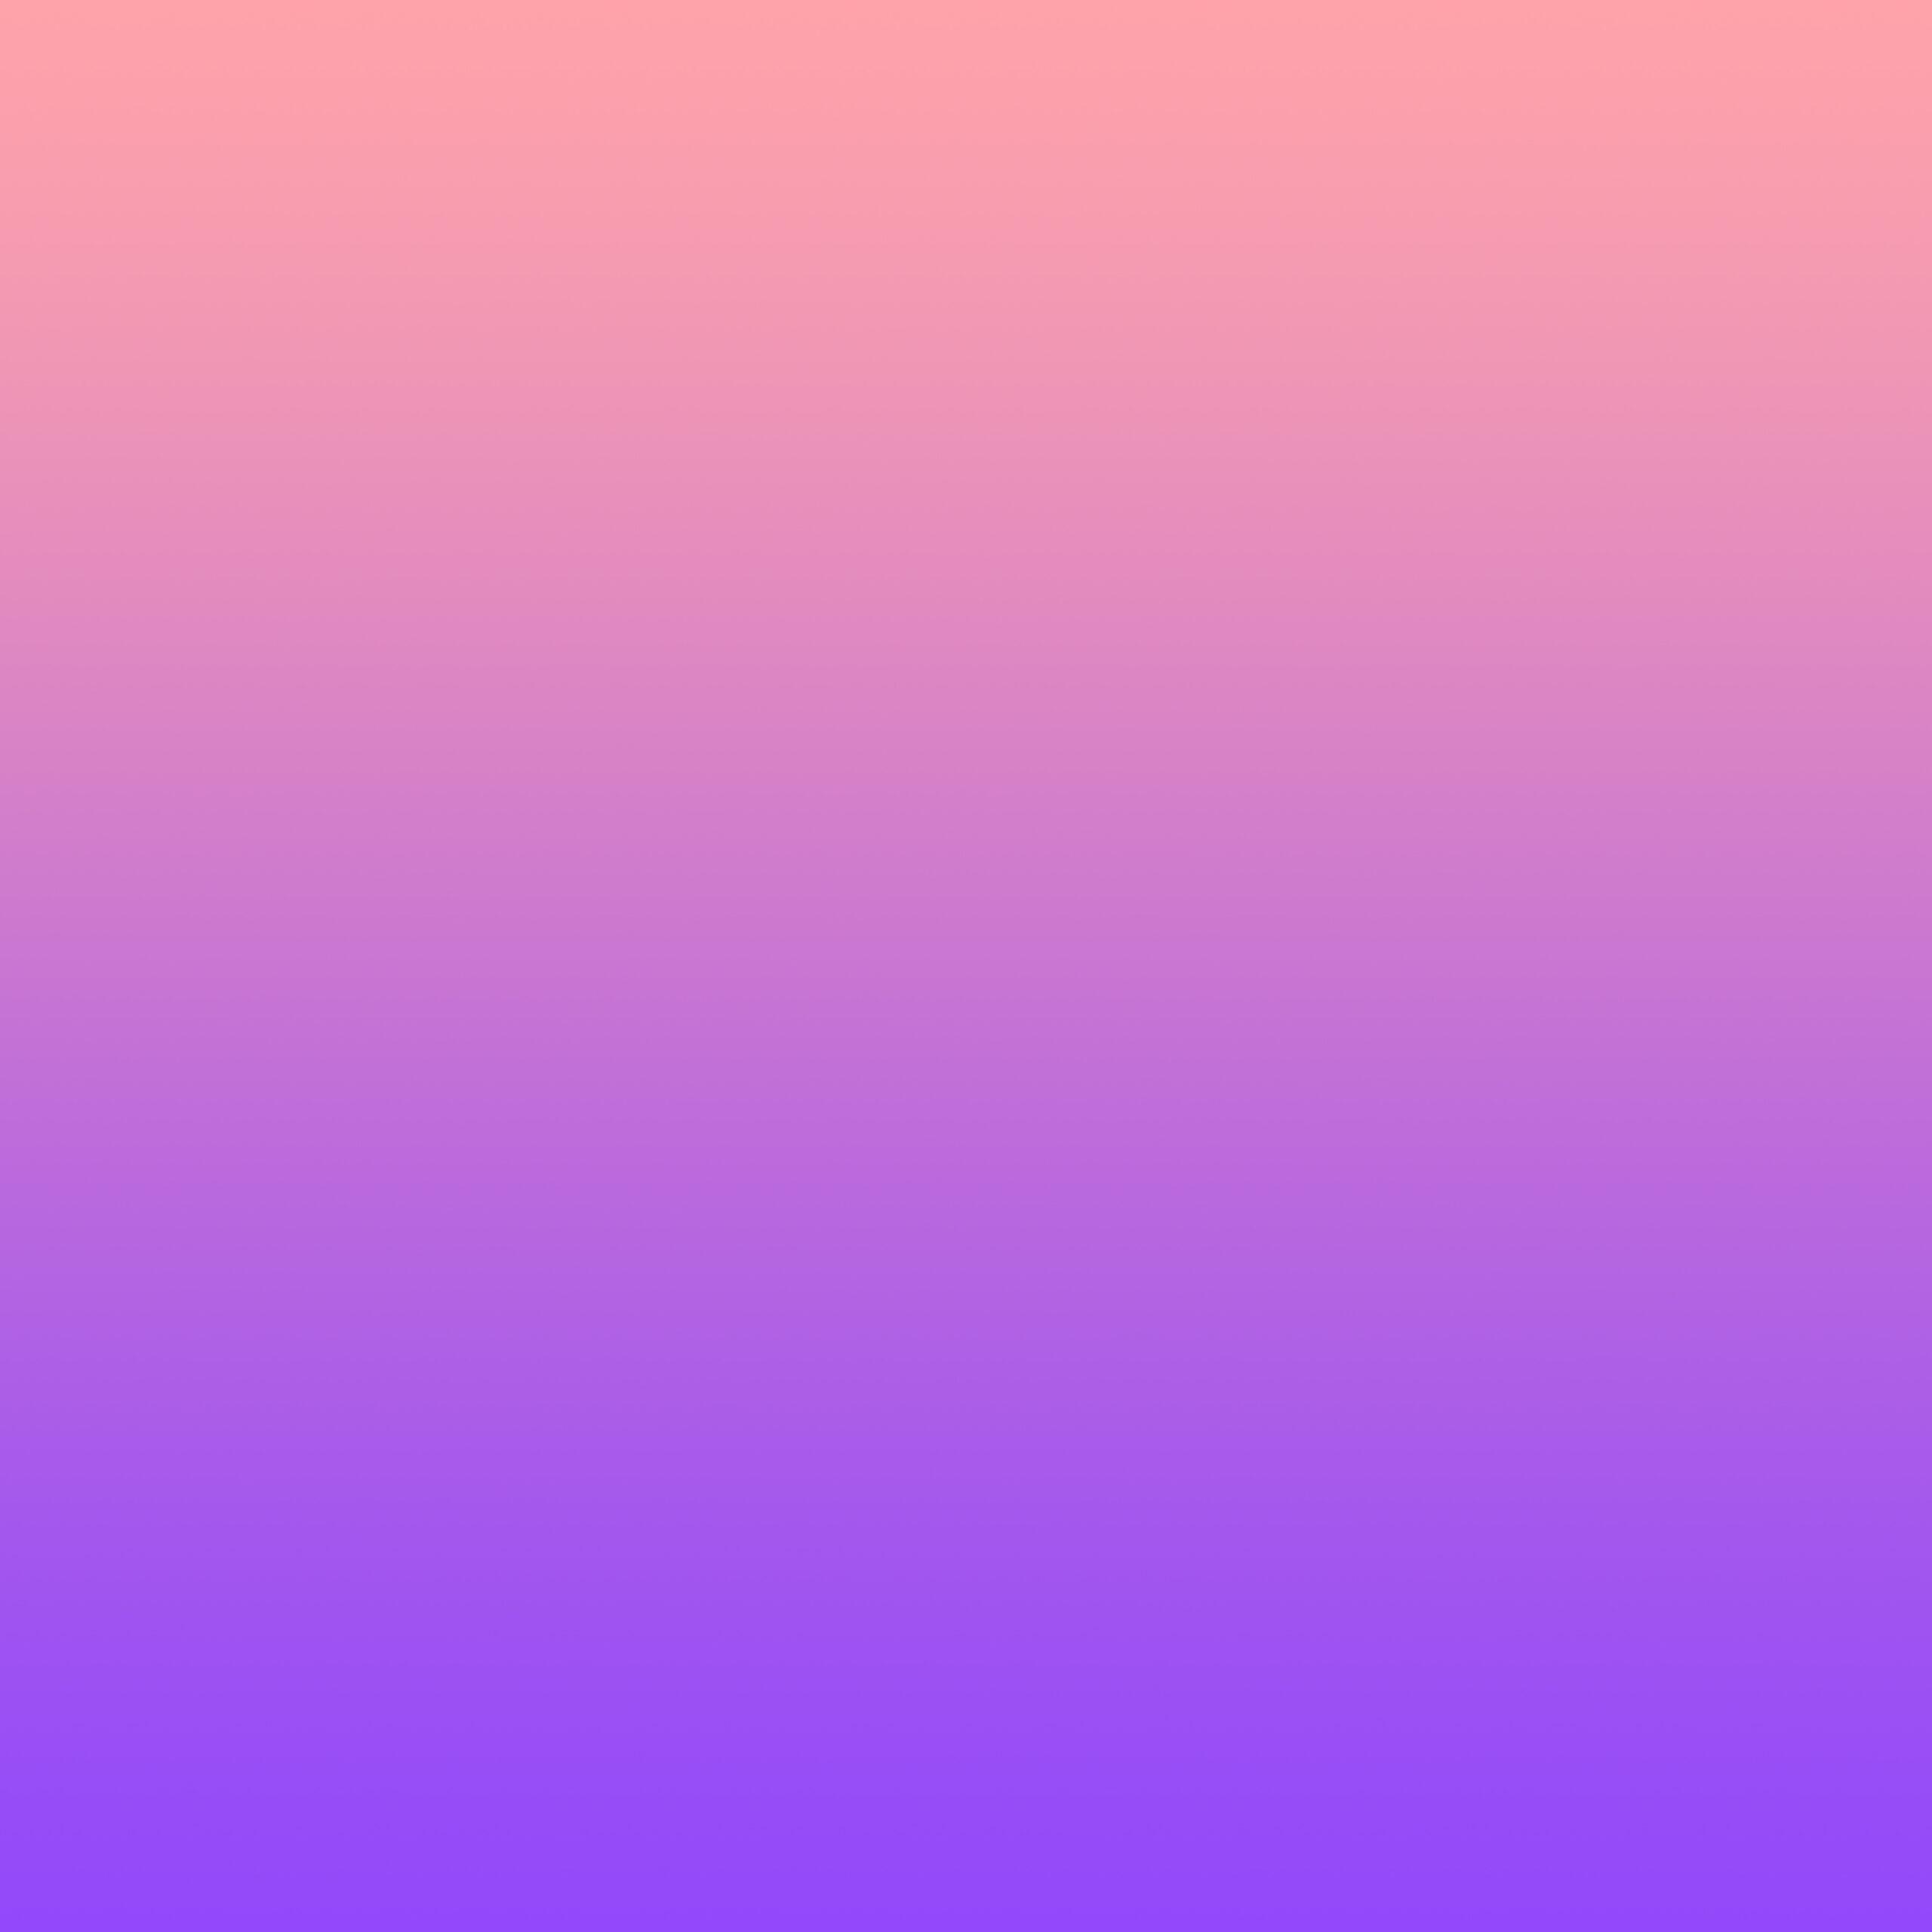 gradient image background